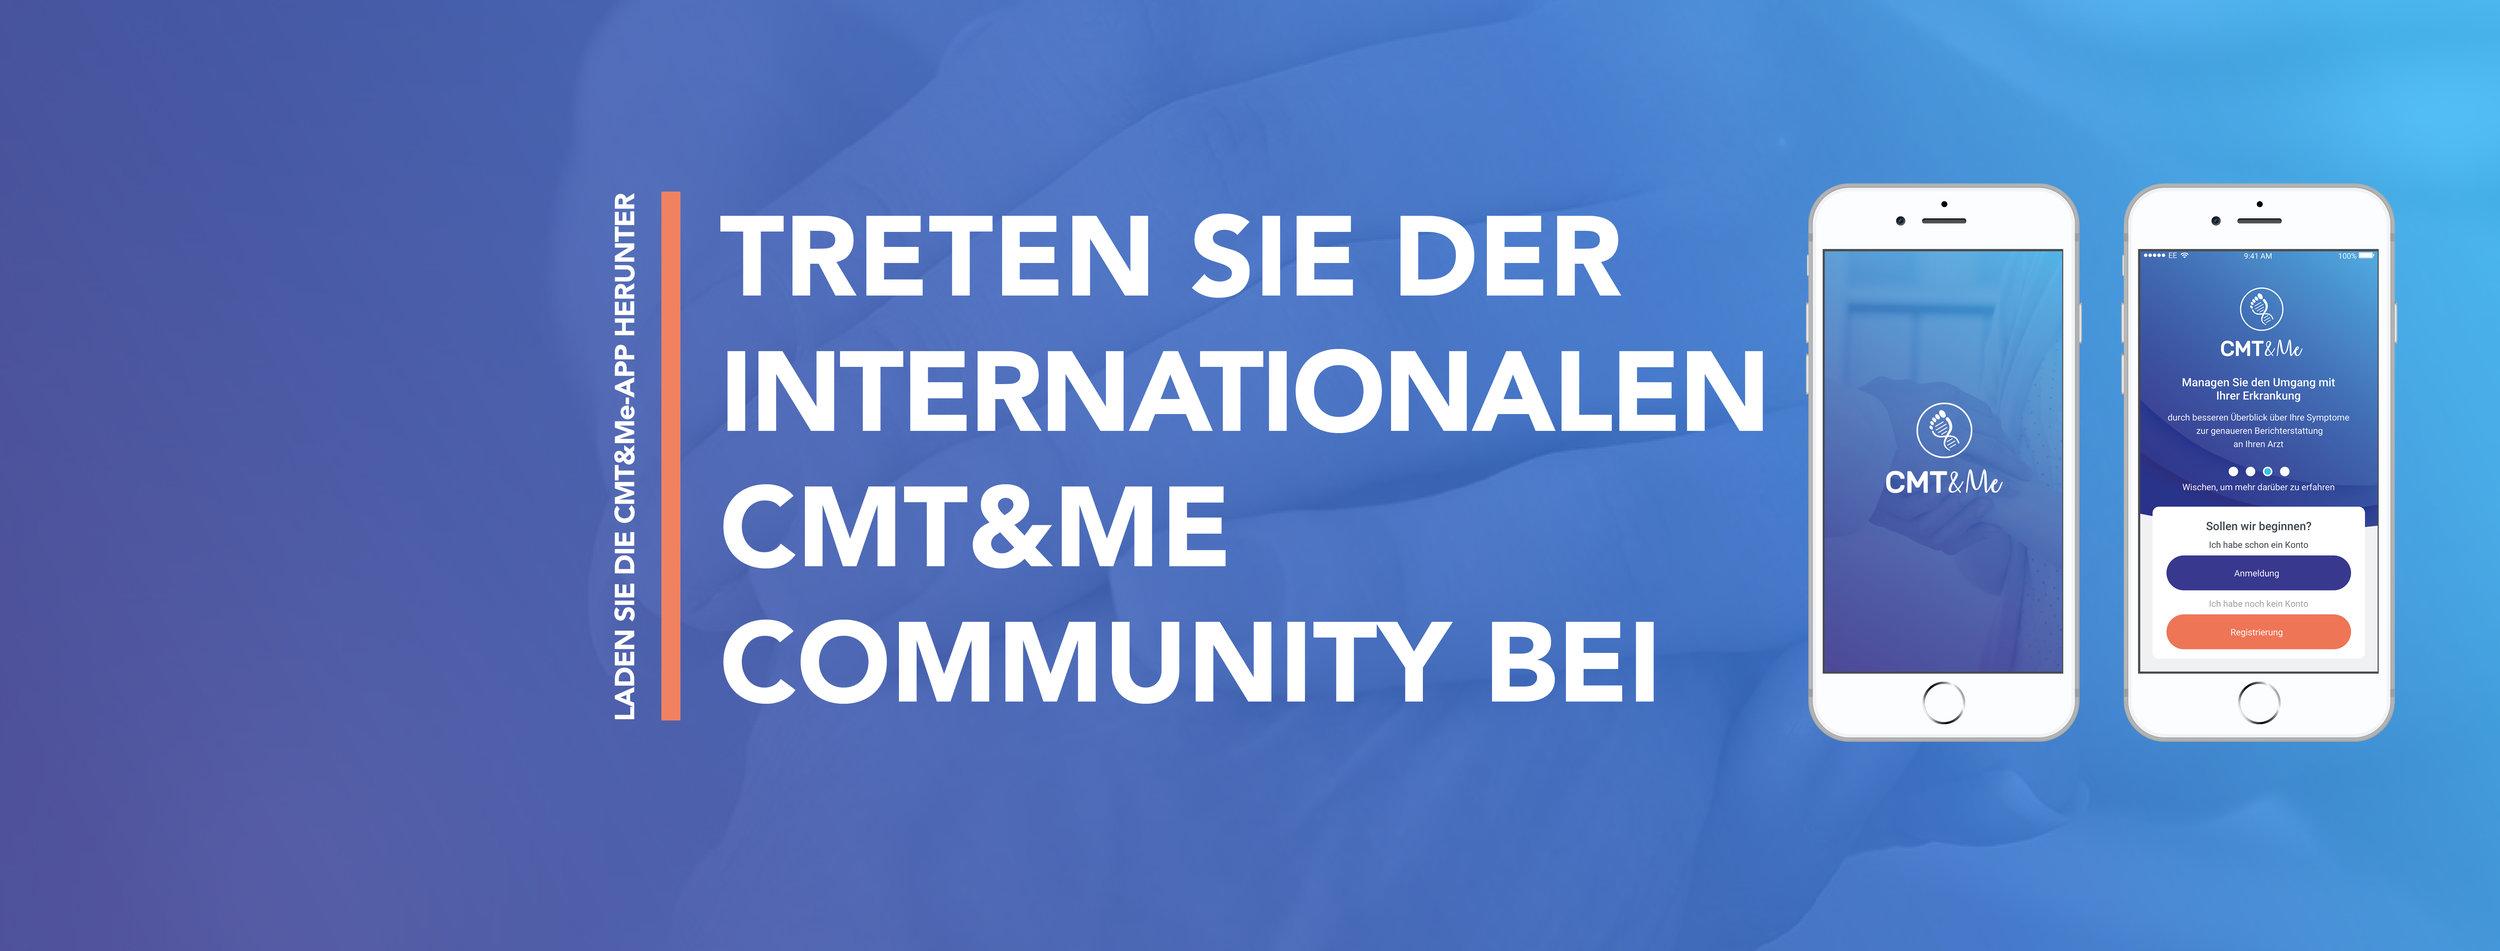 CMT&Me social headers Ger hi-res2.jpg